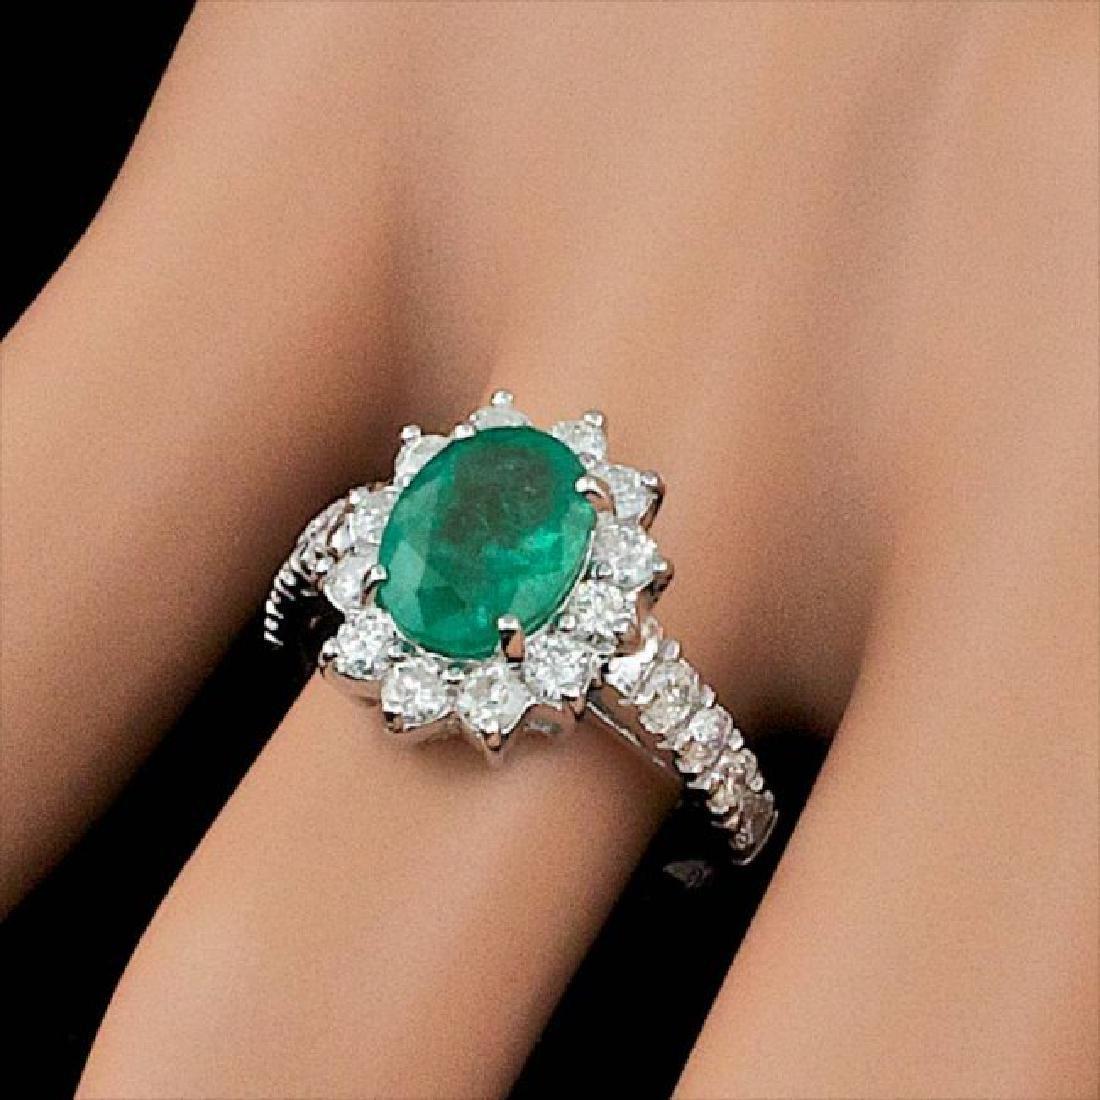 14k White Gold 1.70ct Emerald 0.90ct Diamond Ring - 4